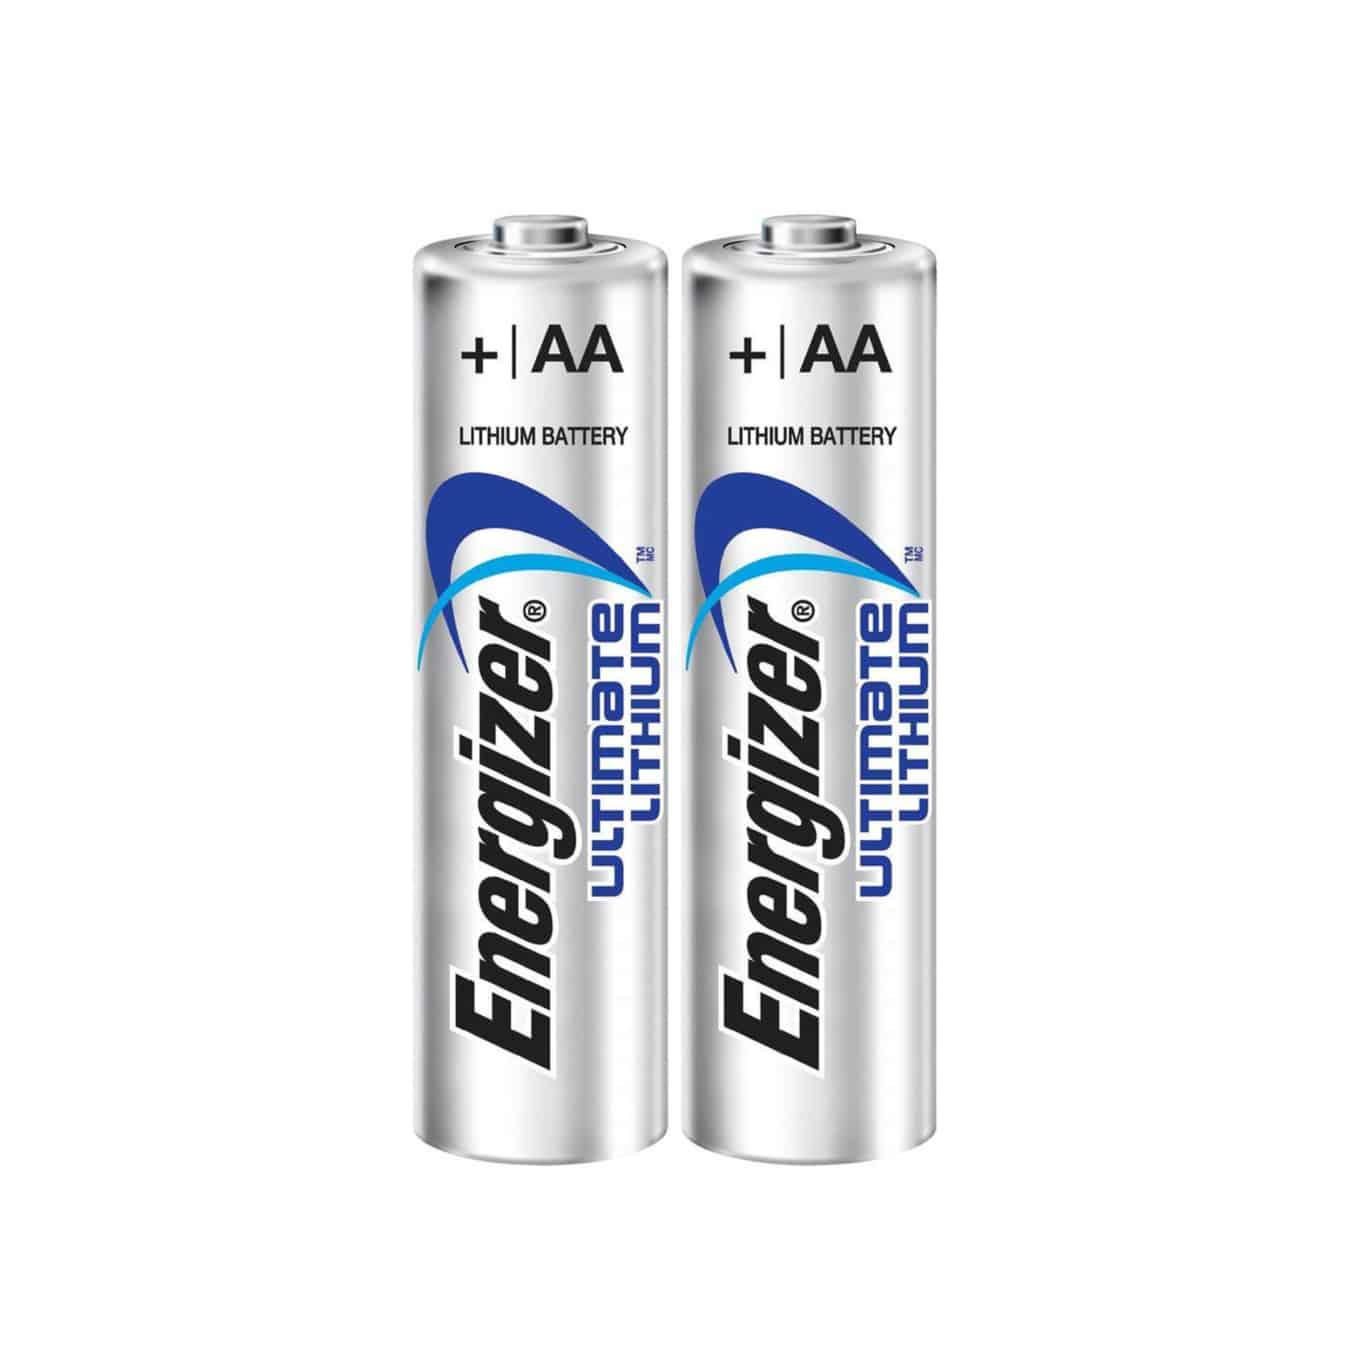 Koop Lithium AA batterijen Energizer Ultimate L91 (2 stuks)